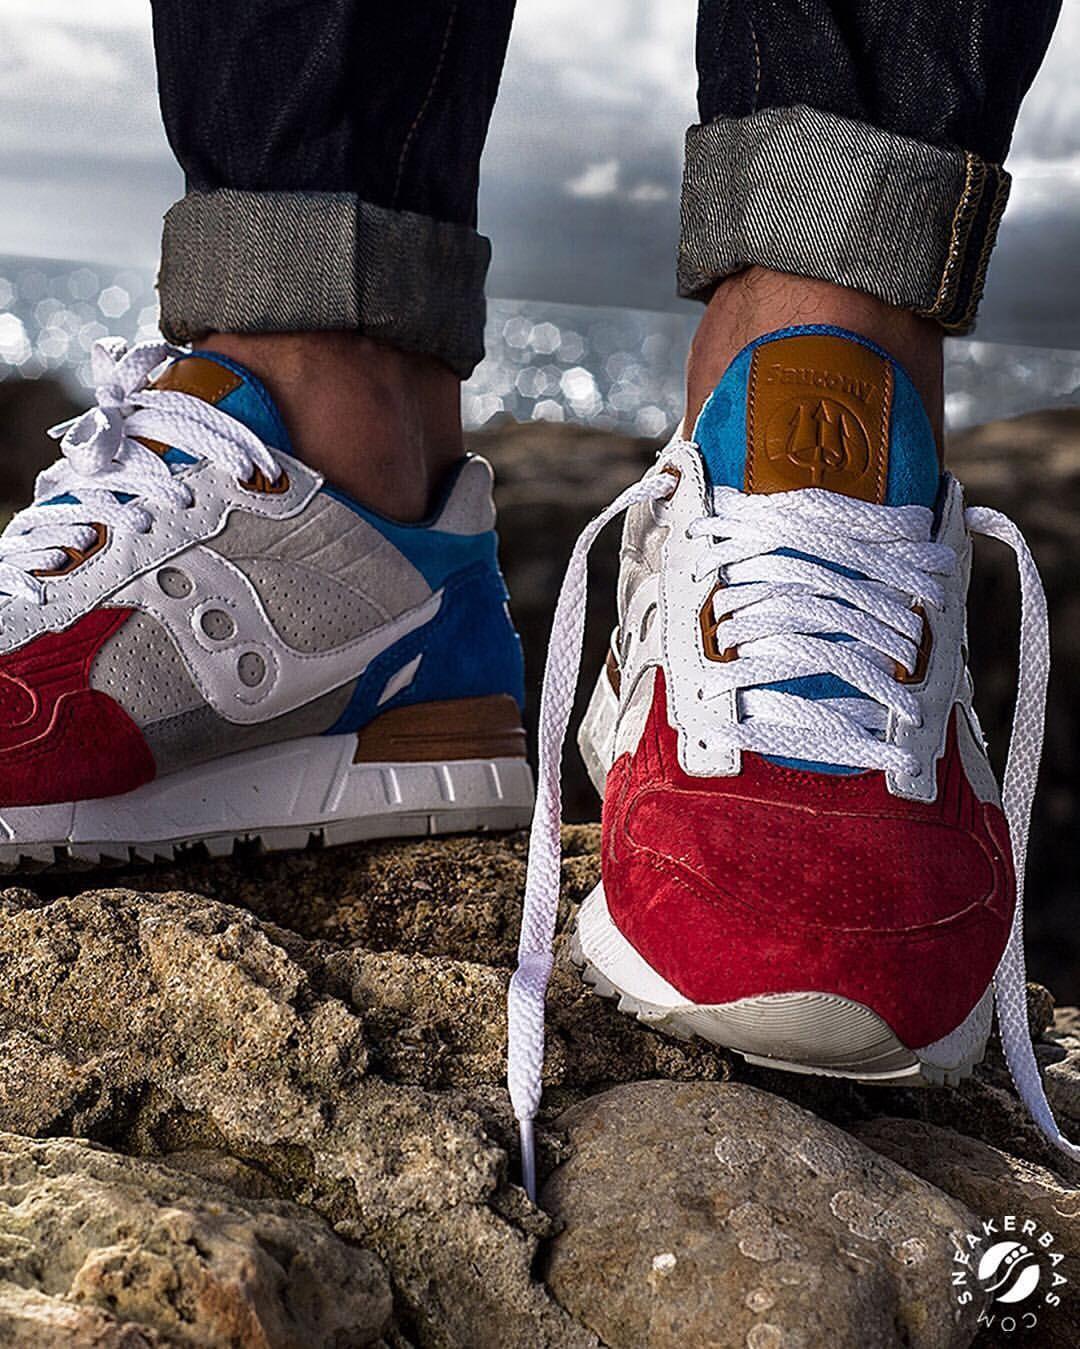 new product 4cc29 ae0fb Saucony Originals Shadow 5000  sneakers  sneakernews  StreetStyle  Kicks   adidas  nike  vans  newbalance  puma  ADIDAS  ASICS  CONVERSE  DIADORA   REEBOK   ...